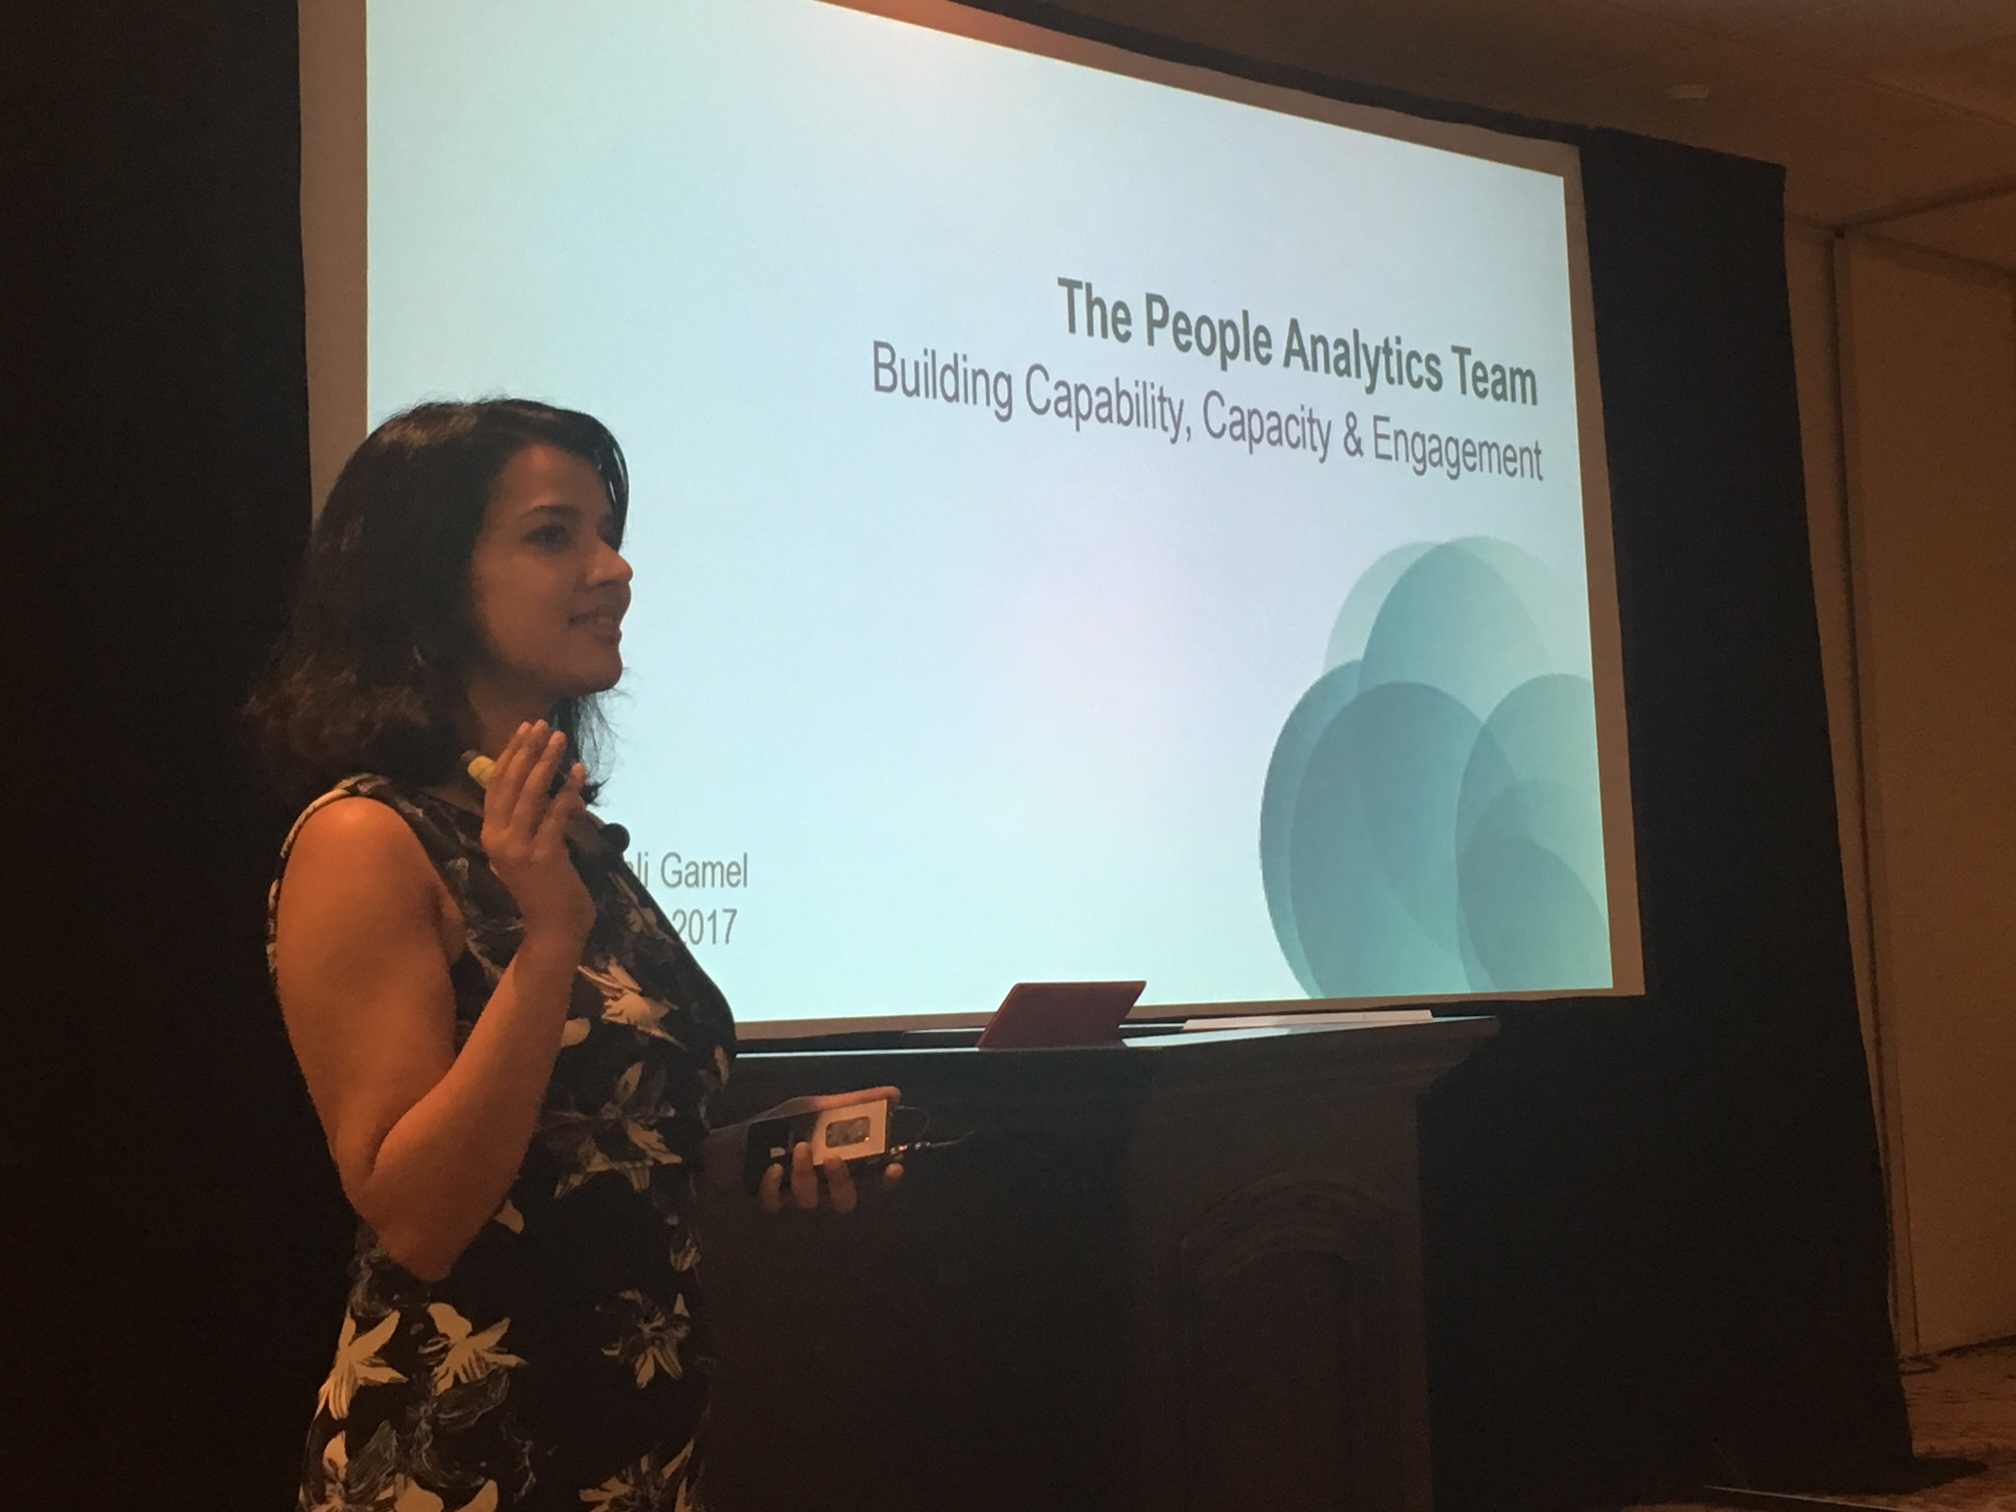 Geetanjali Gamel speaking at the People Analytics & Future of Work Conference in Philadelphia in September 2017